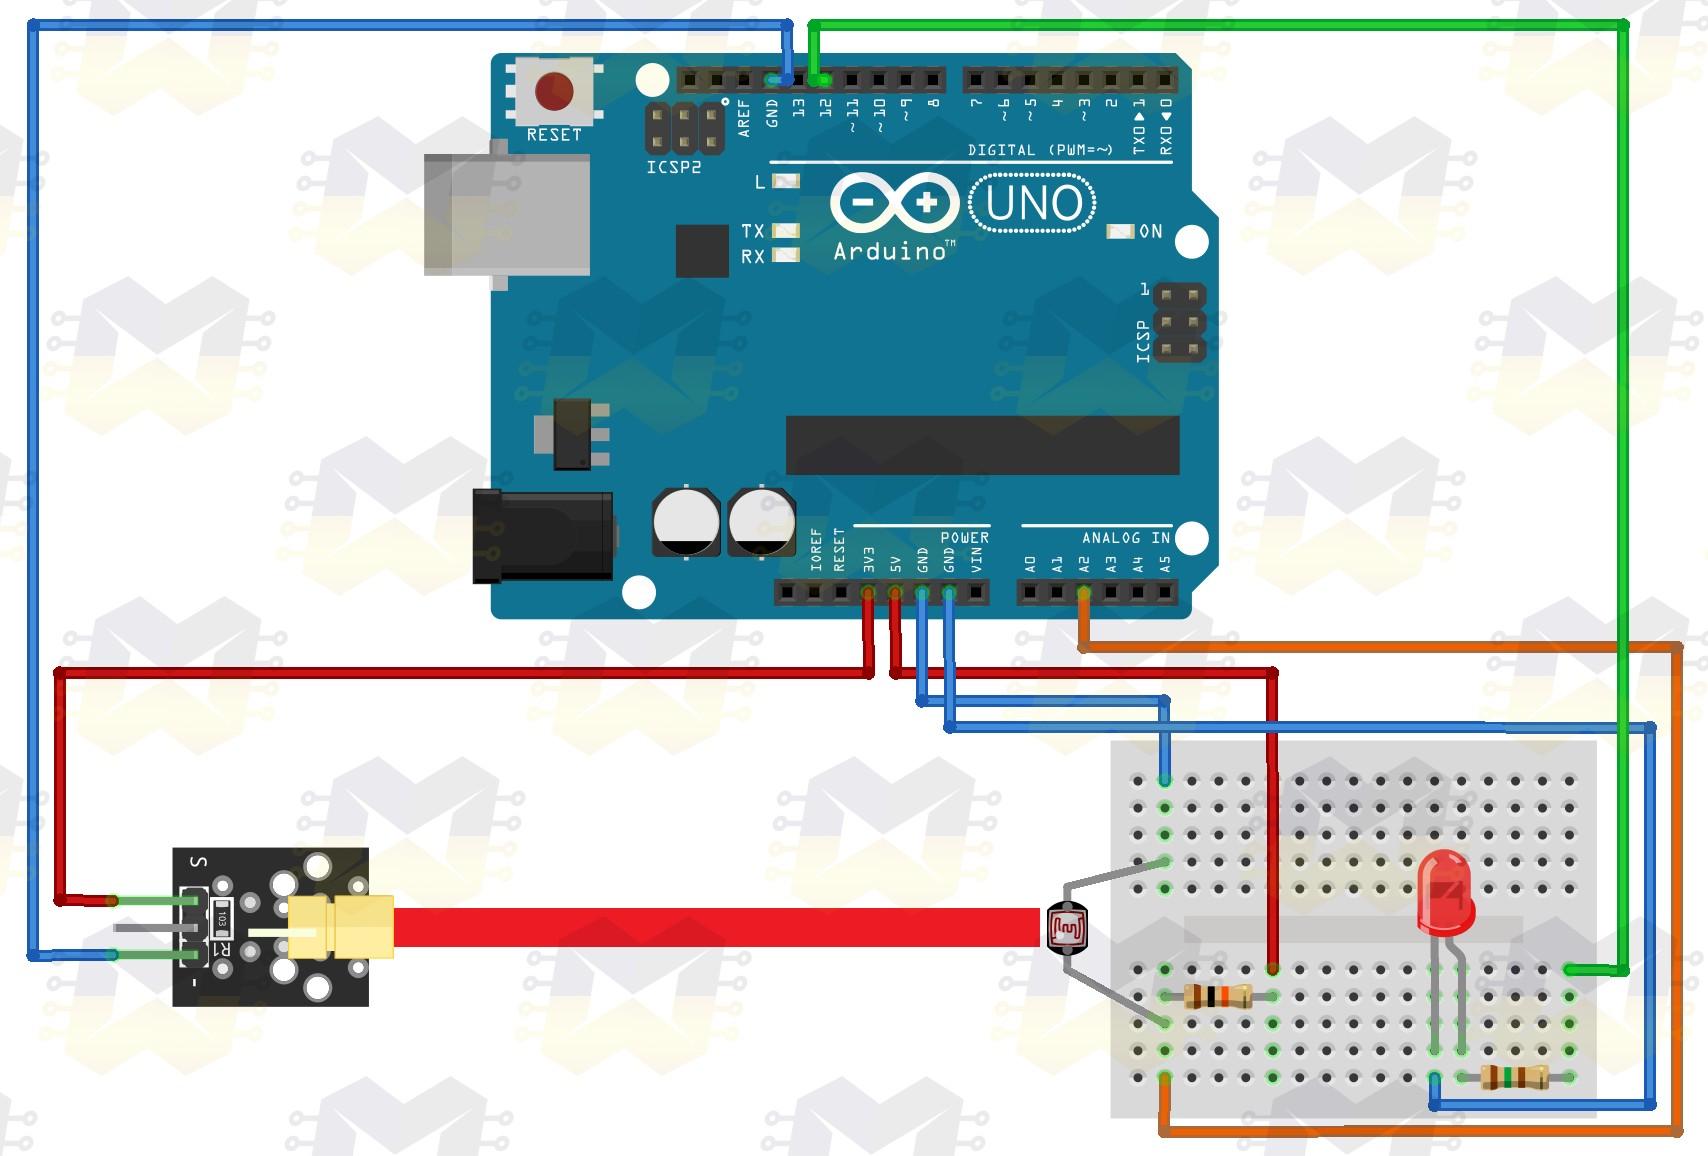 img01_como_usar_com_arduino_modulo_laser_led_6mm_650nm_de_alta_potencia_luz_uno_mega_nano